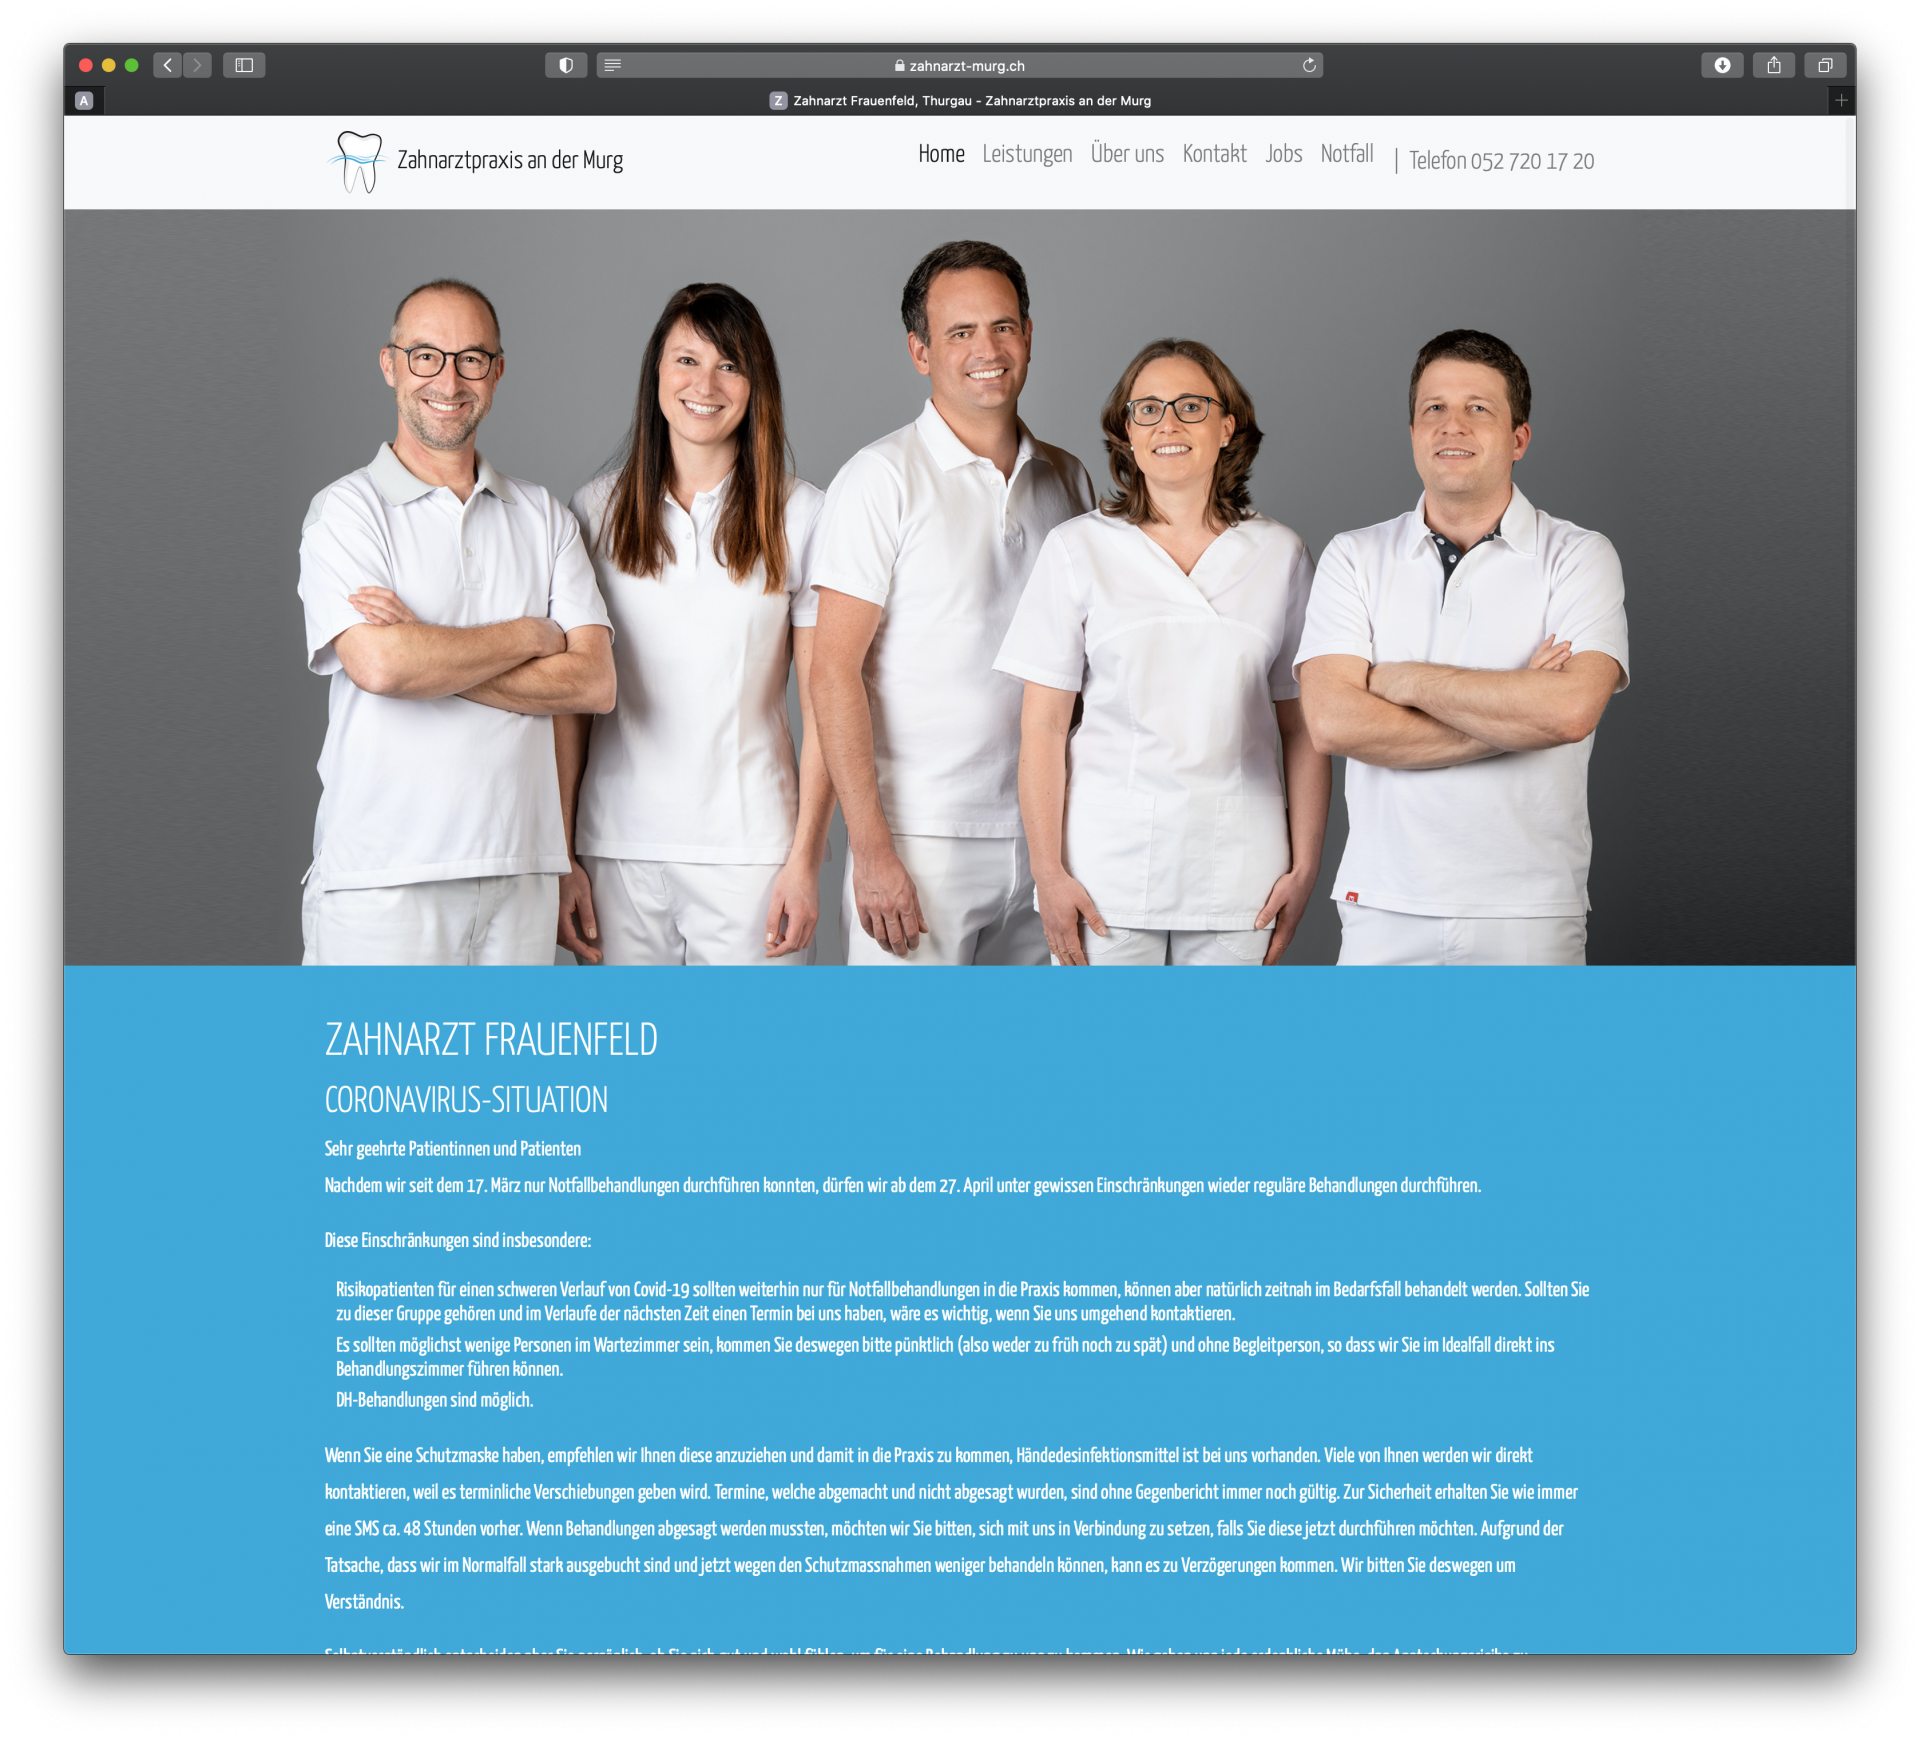 Zahnarzt Murg in Frauenfeld